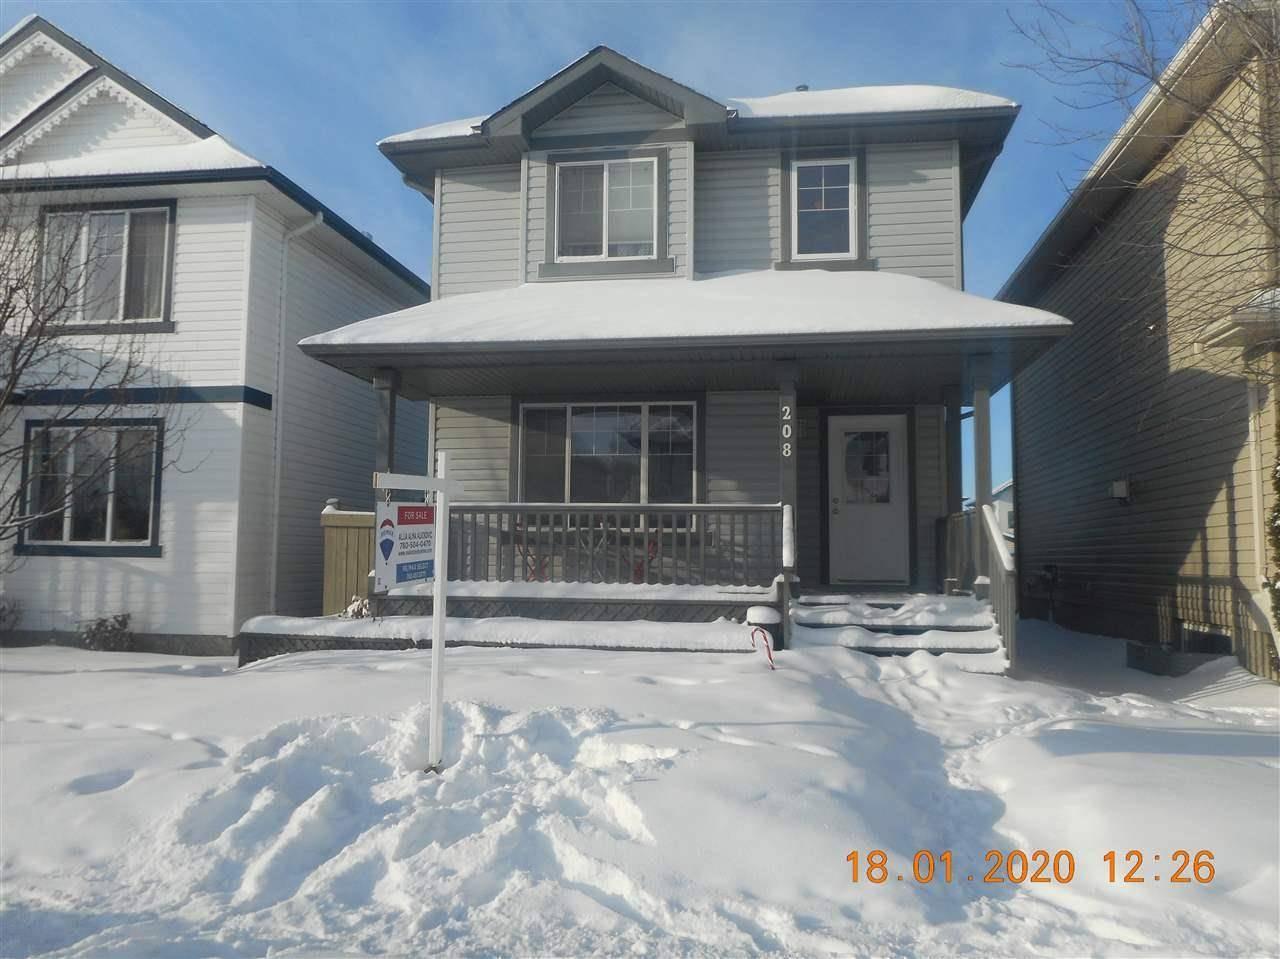 House for sale at 208 84 St Sw Edmonton Alberta - MLS: E4184156